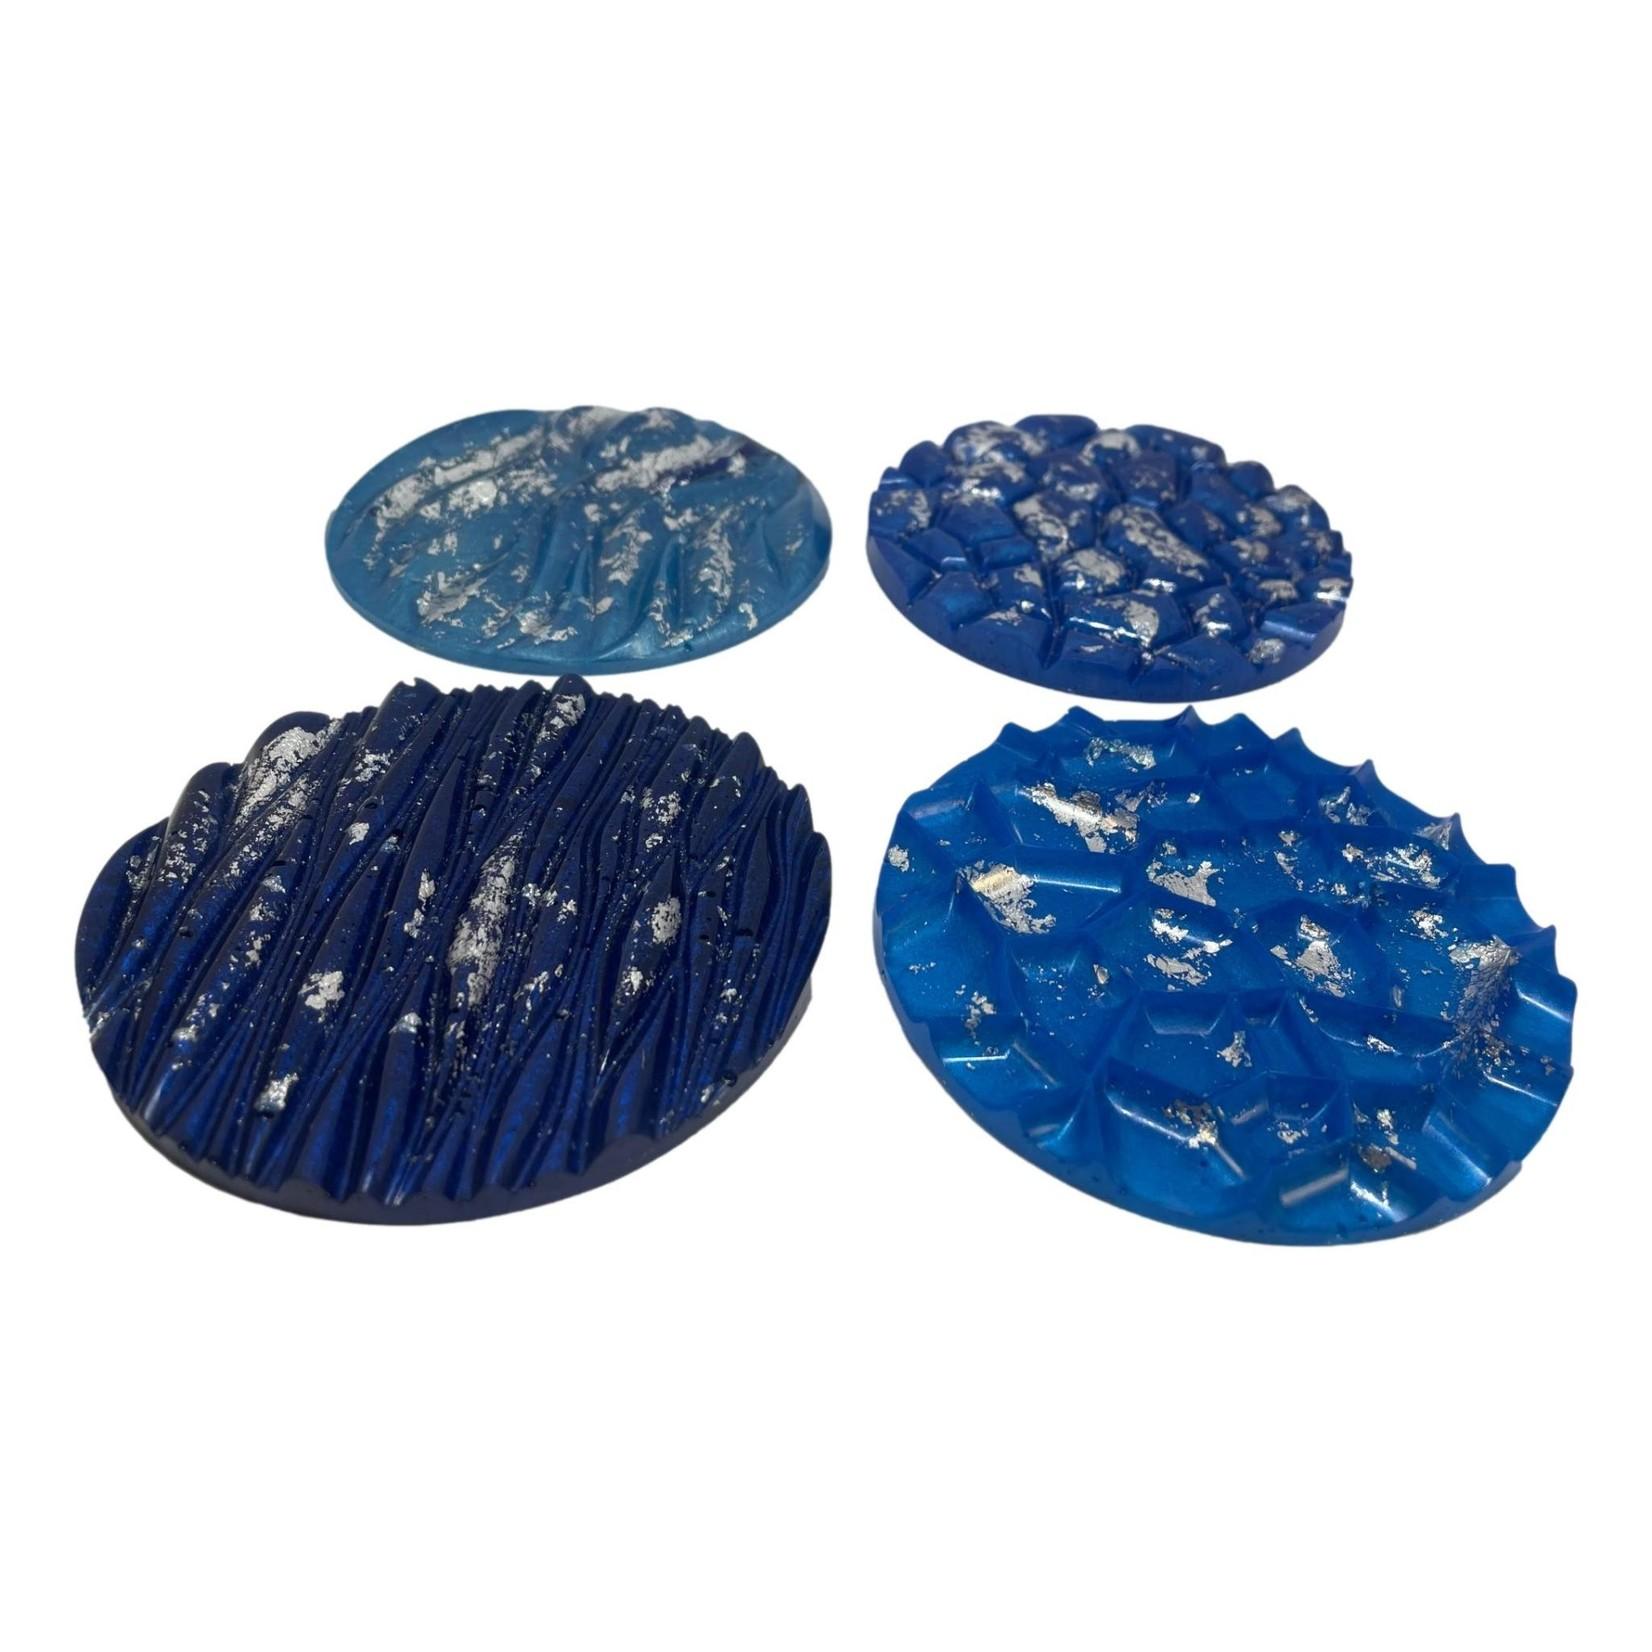 East Coast Sirens Blue Coaster Set with Tray